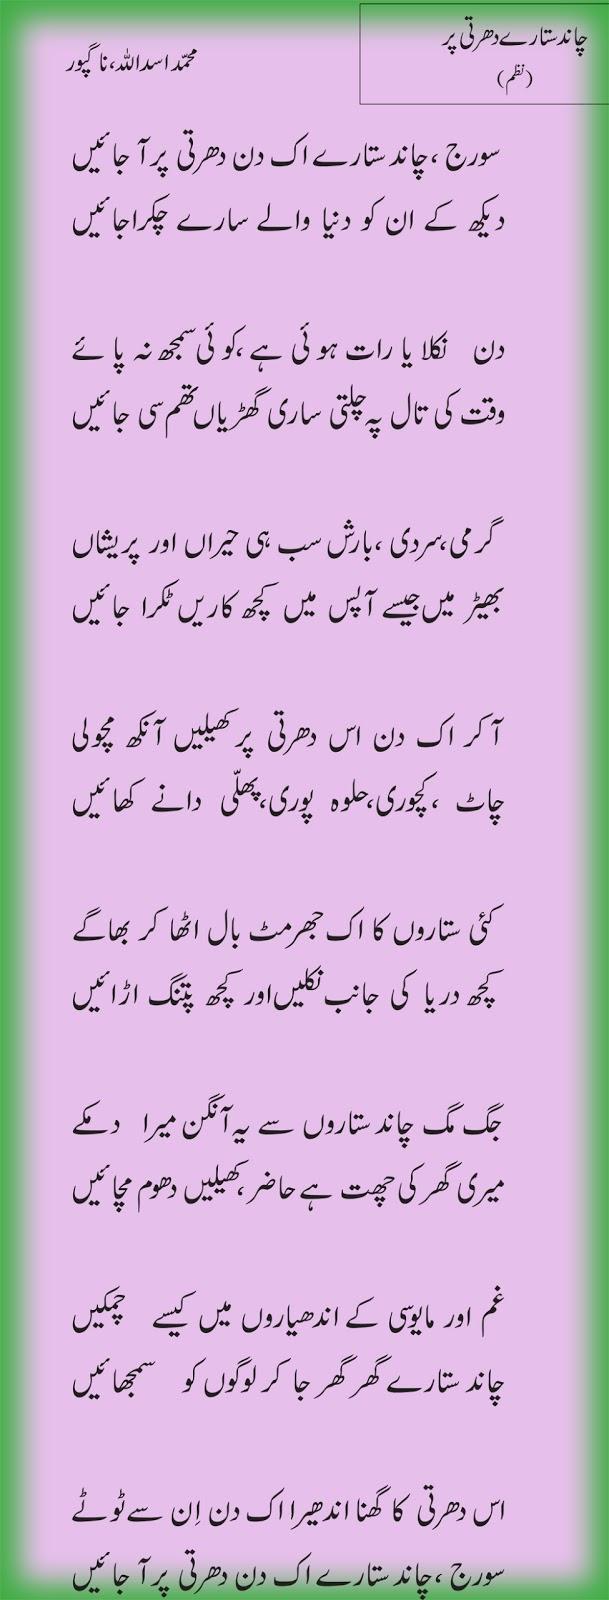 Bazm-e-Urdu: urdu poems for children